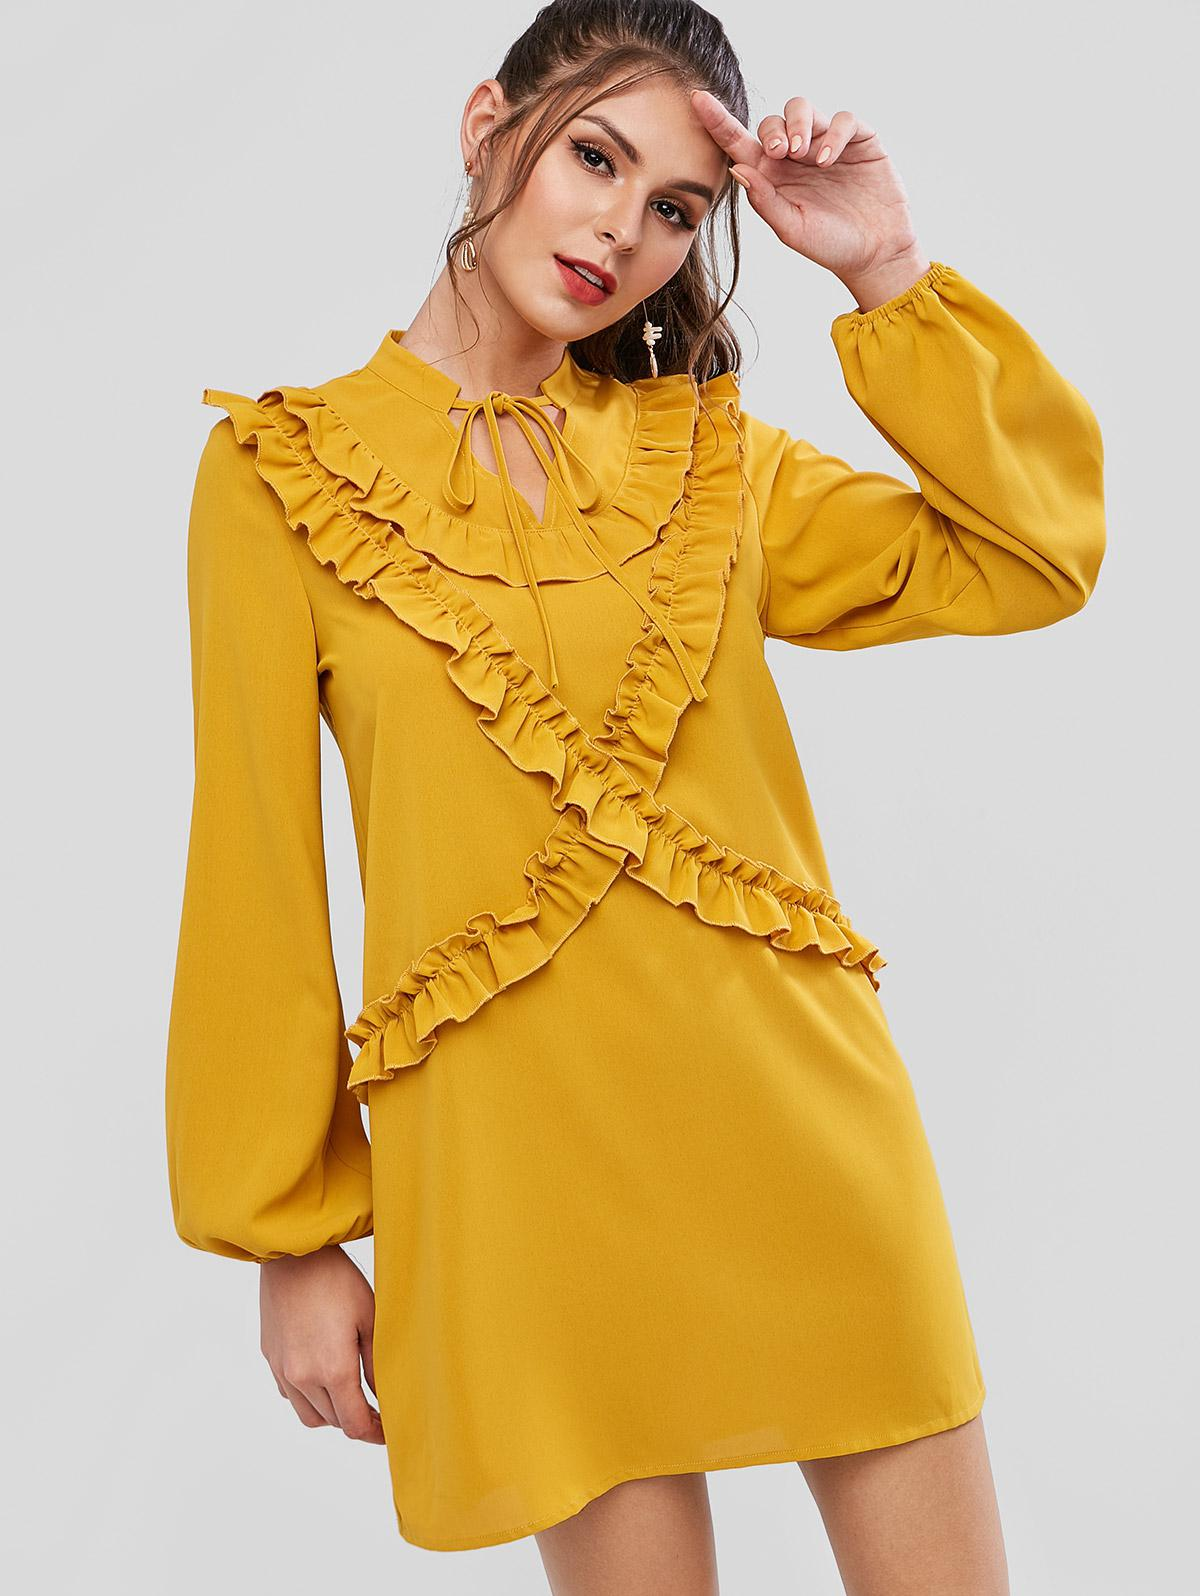 ZAFUL Tie Collar Lettuce Trim Keyhole Long Sleeve Dress